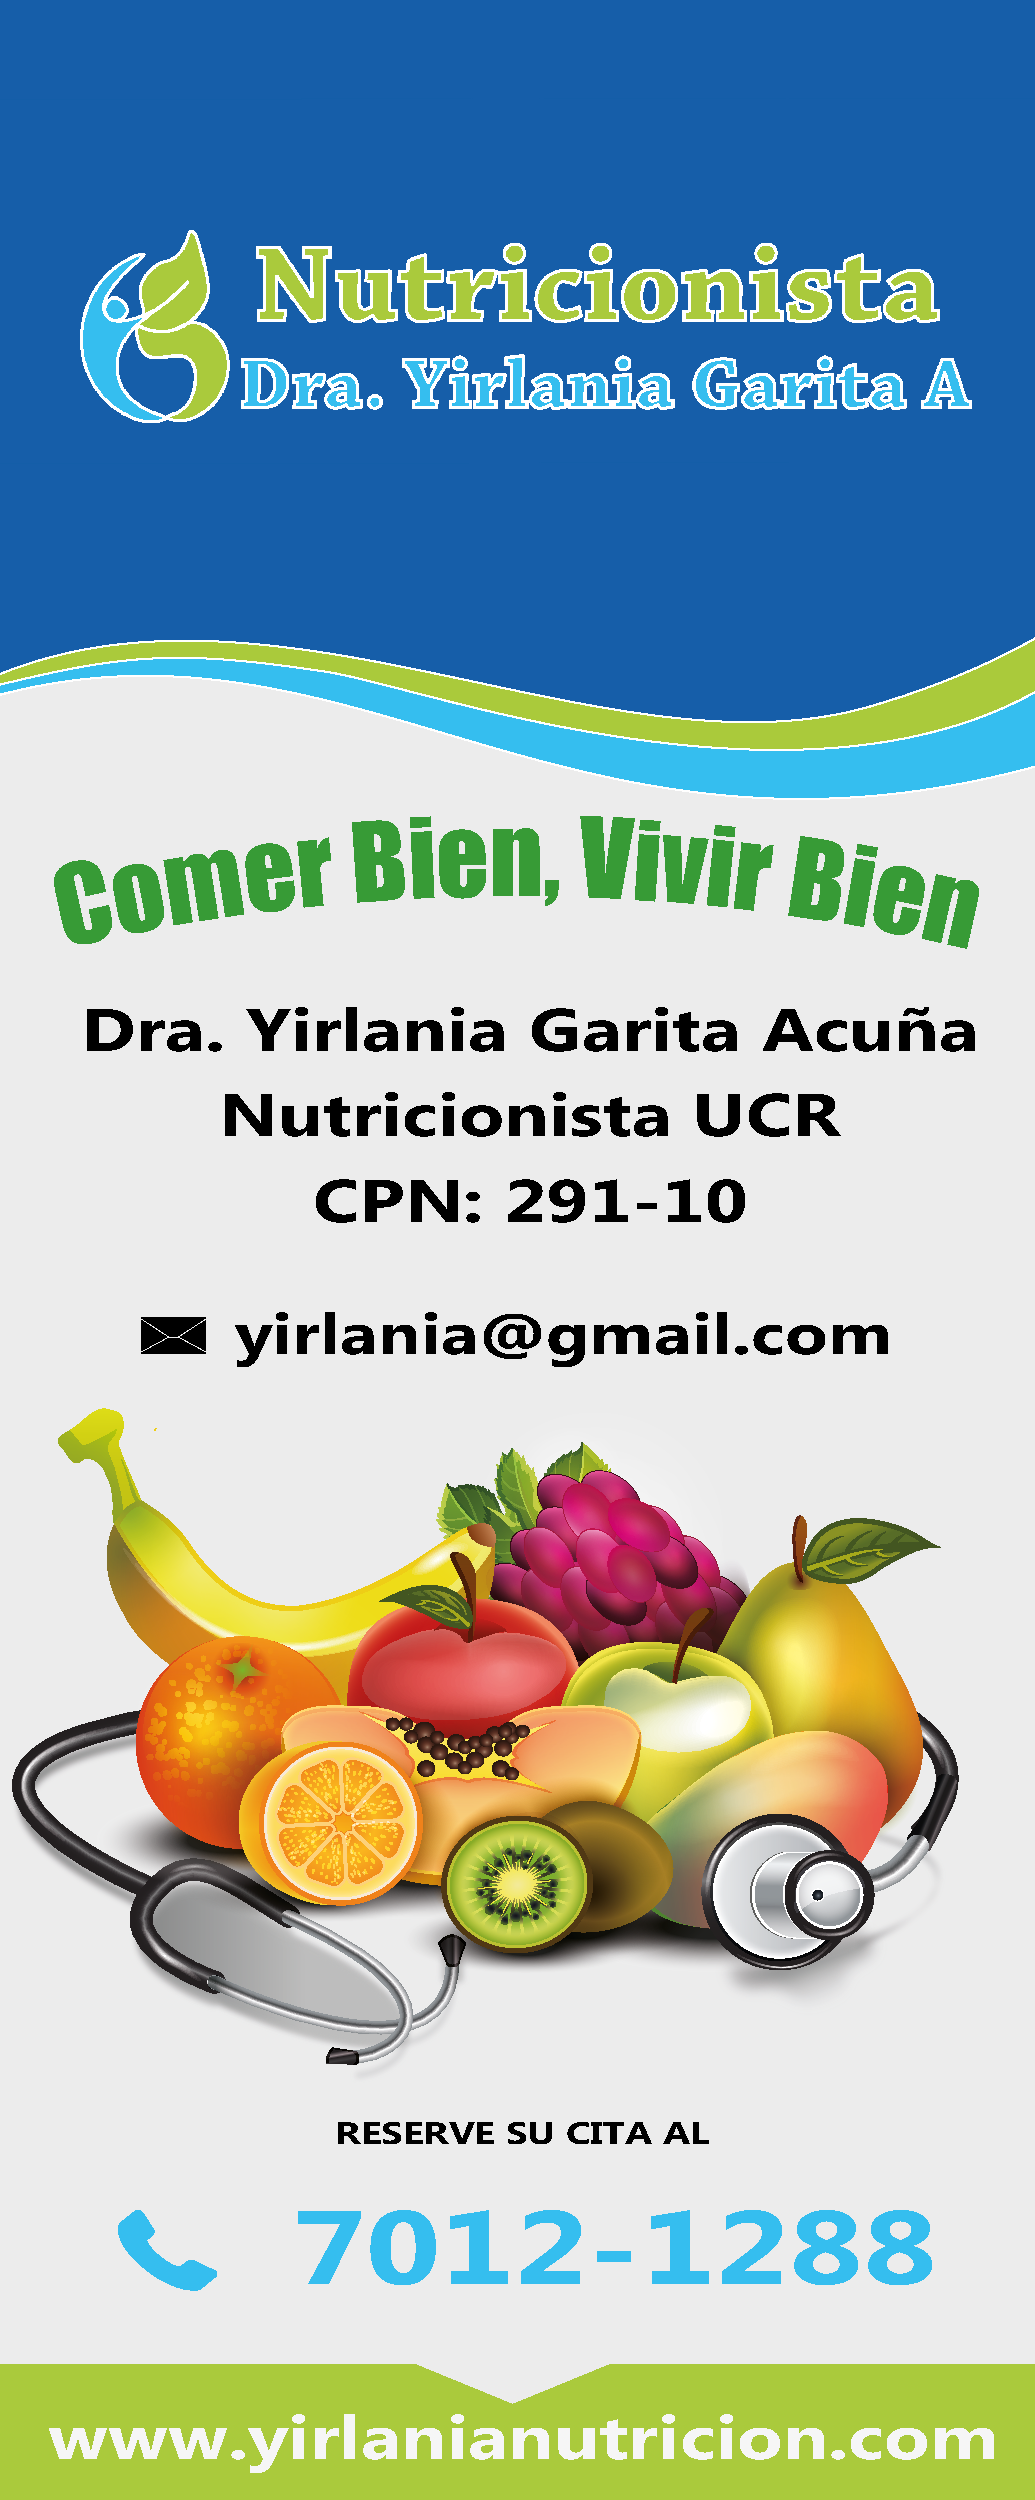 Yirlania Nutricionista